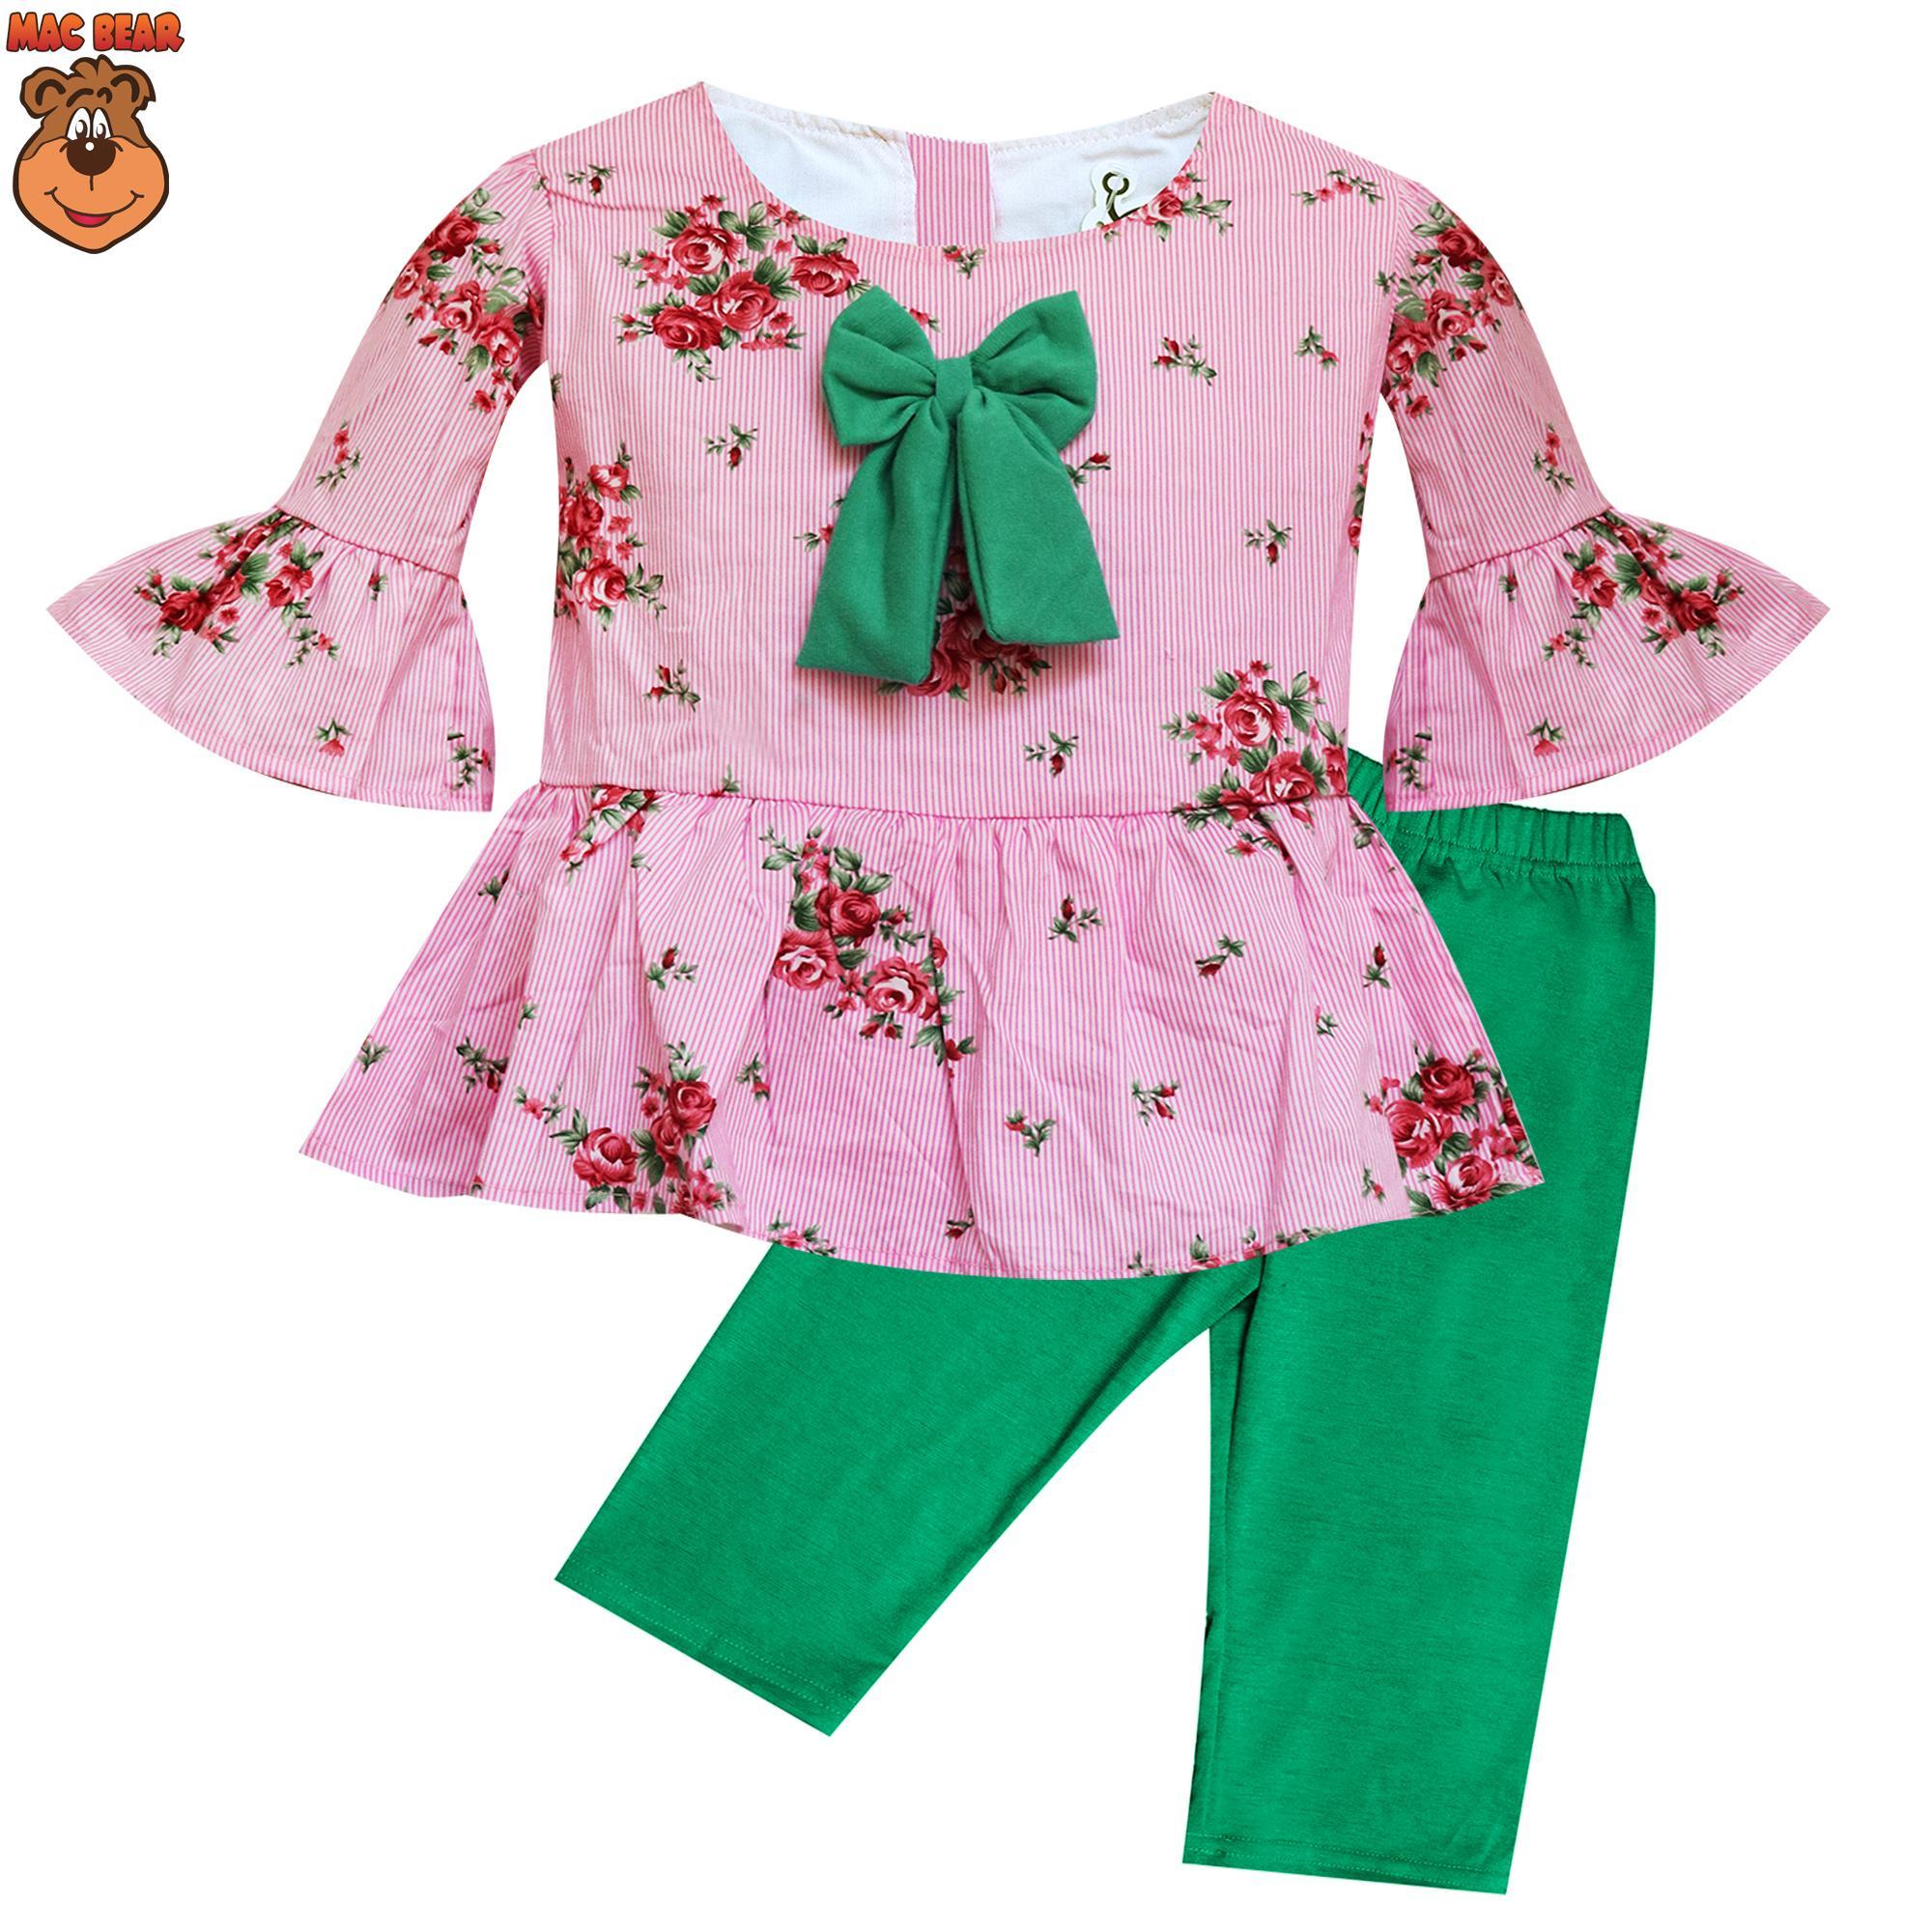 MacBee Baju Anak Setelan Harumi Flowers